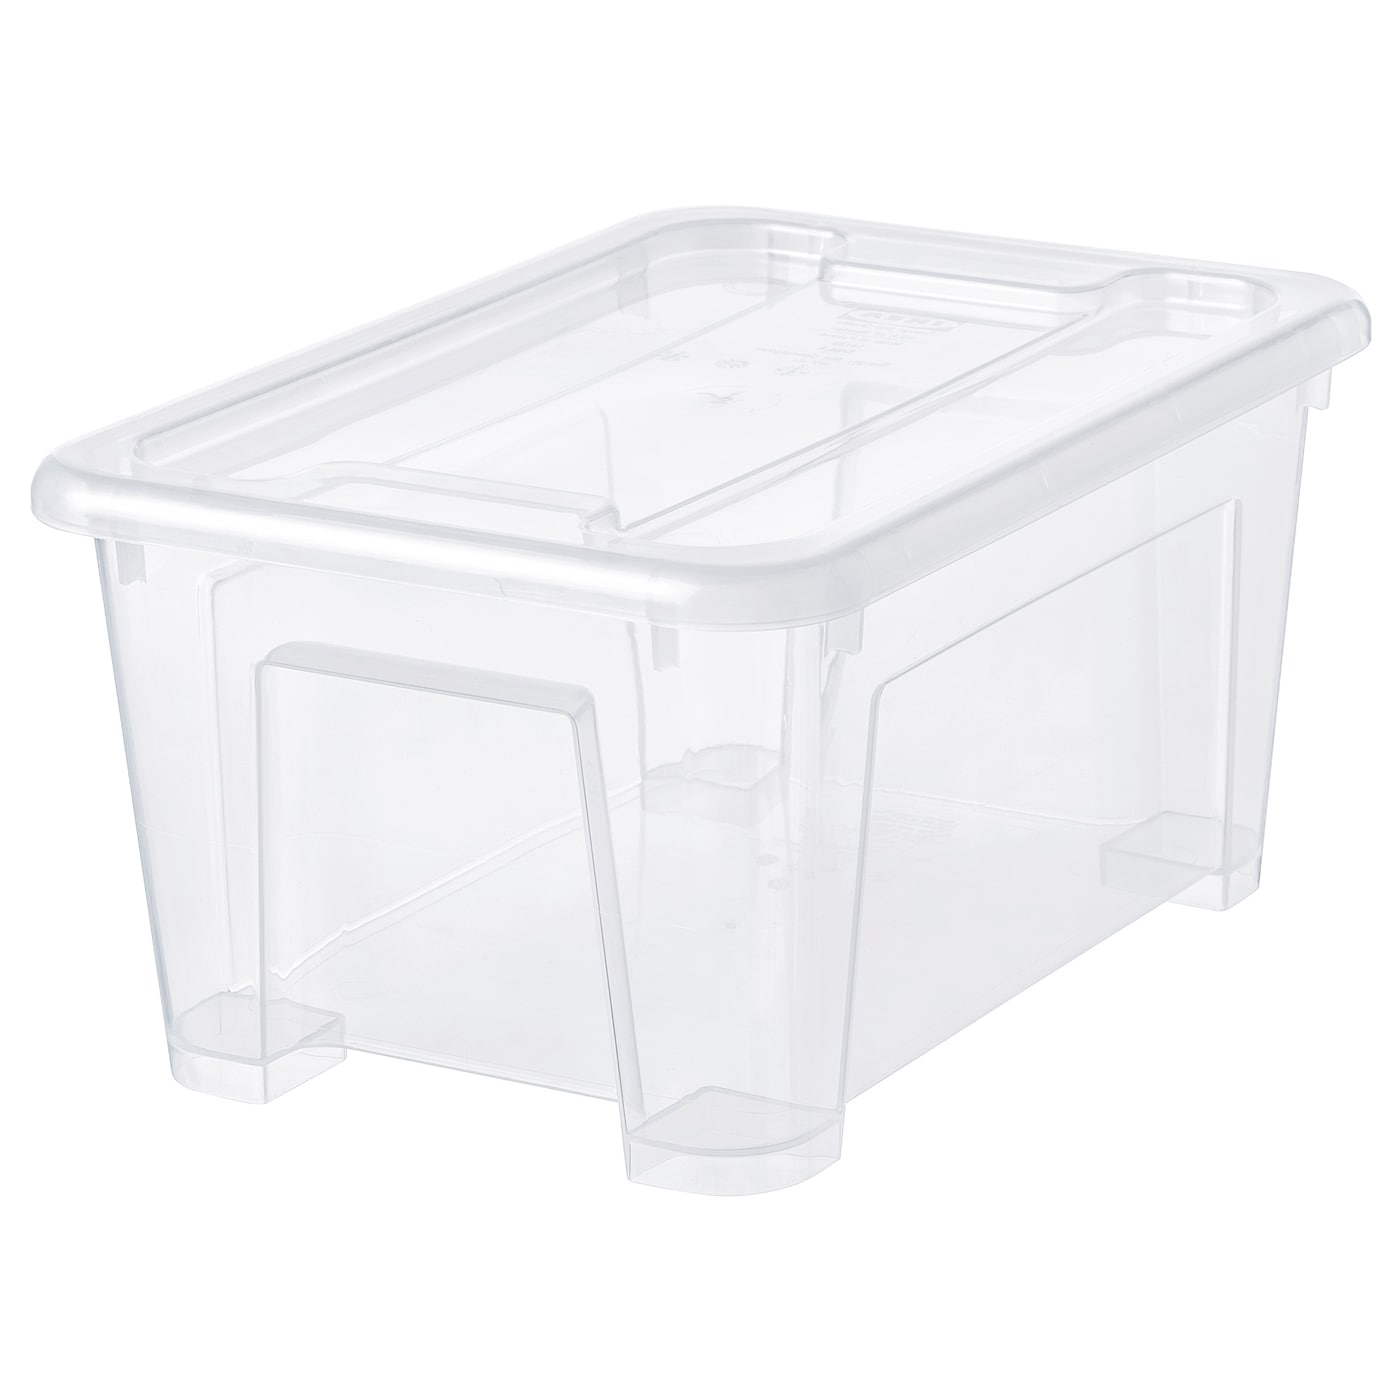 Picture of: Samla Boks Med Lag Transparent 28x20x14 Cm 5 L Ikea